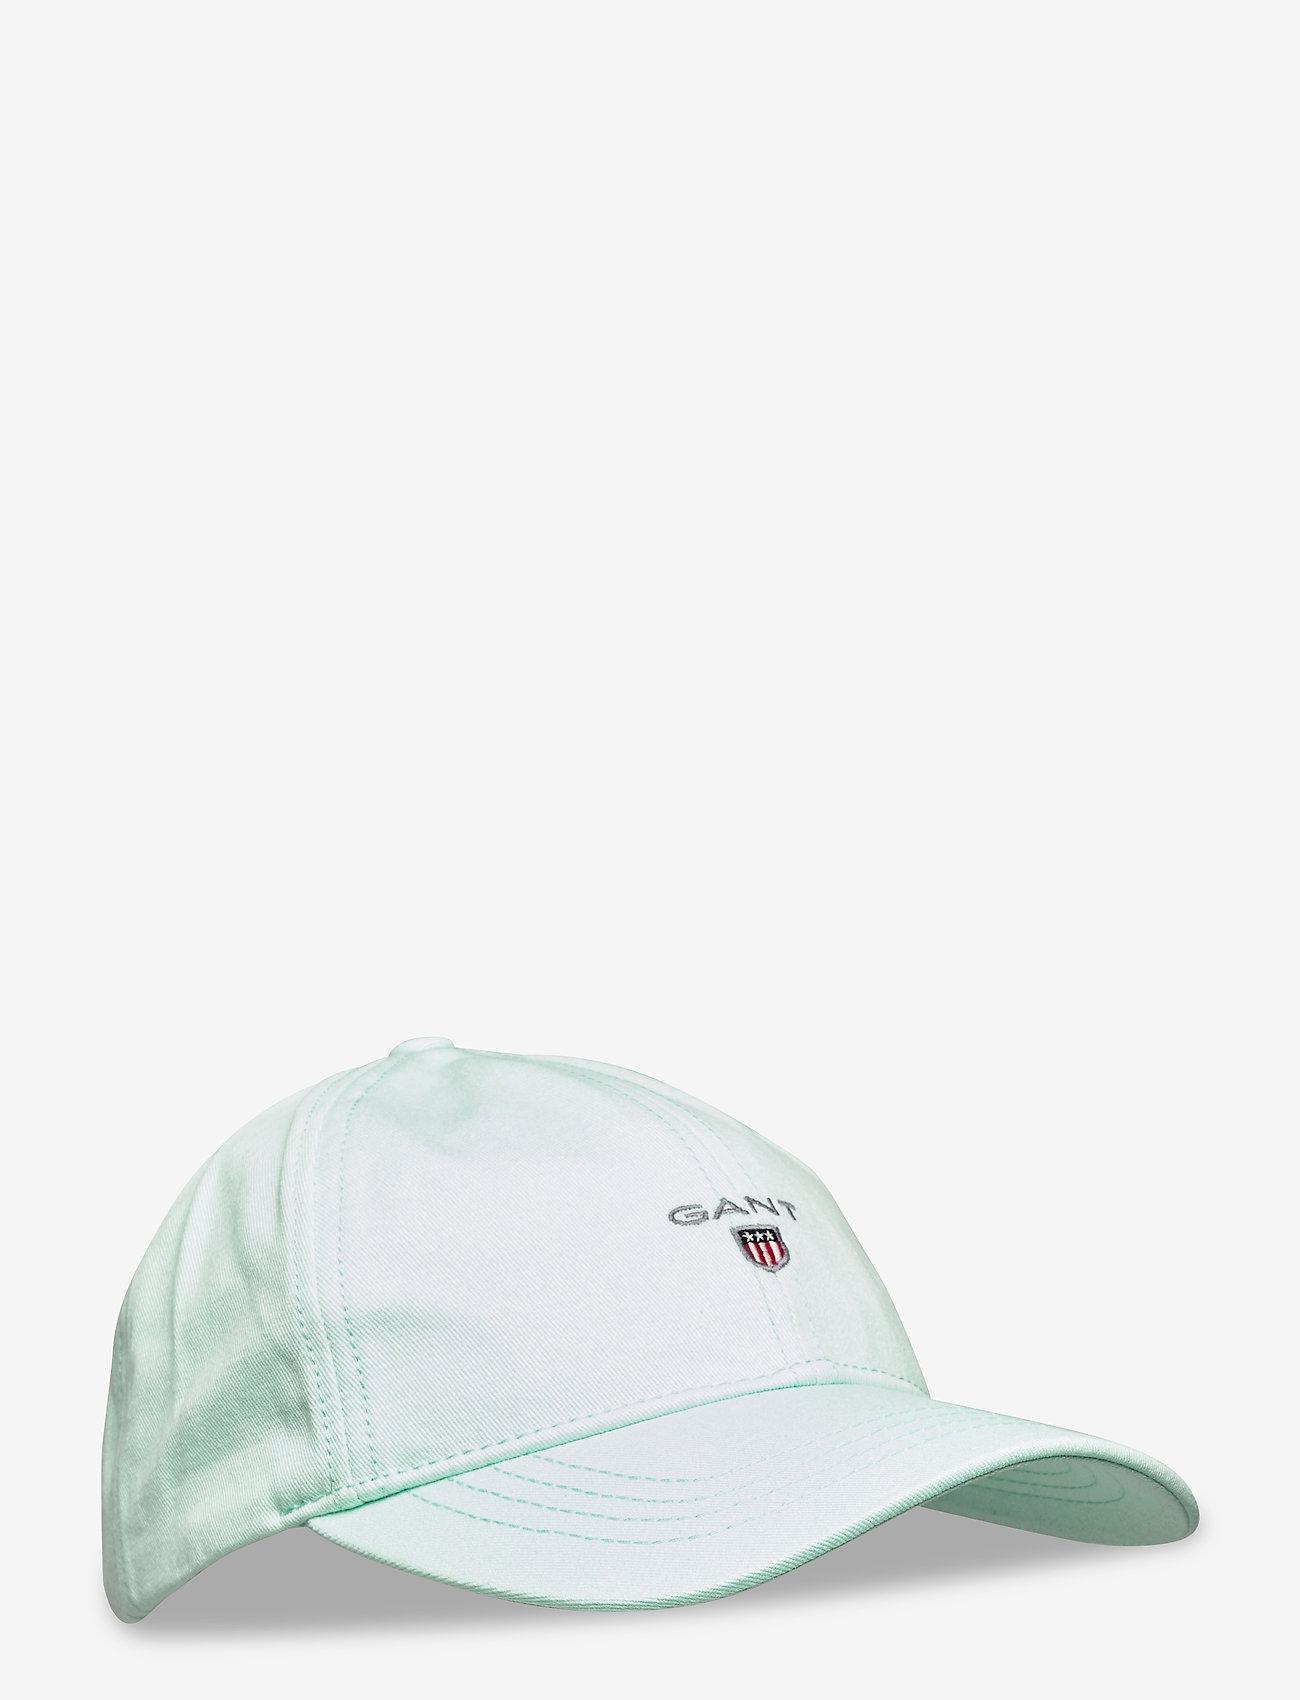 GANT - COTTON TWILL CAP - czapki - bay green - 0